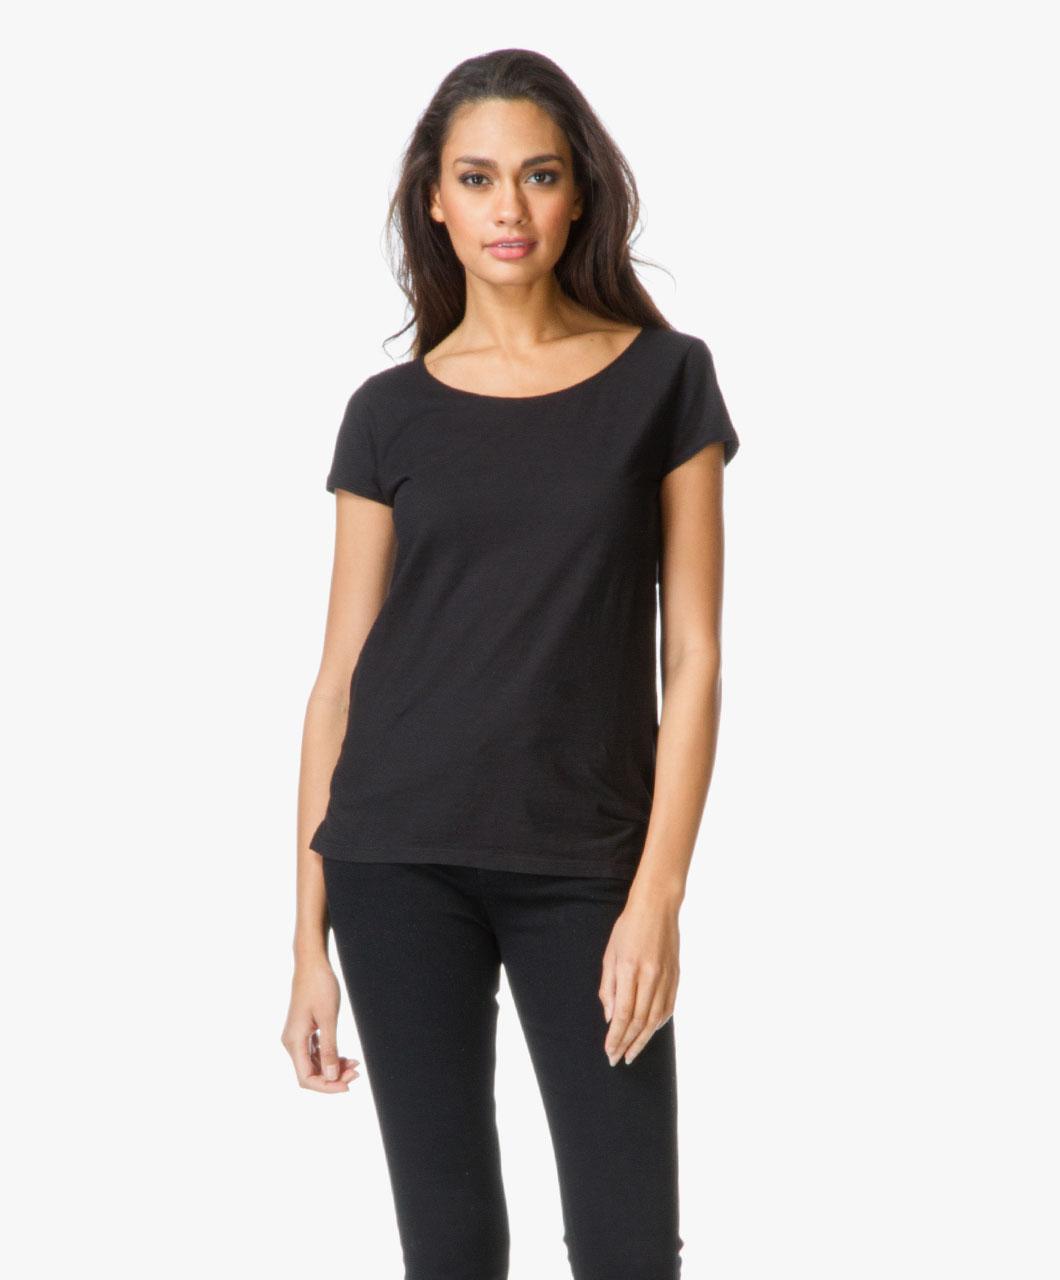 drykorn cotton aviva t shirt black aviva 506100 1000. Black Bedroom Furniture Sets. Home Design Ideas